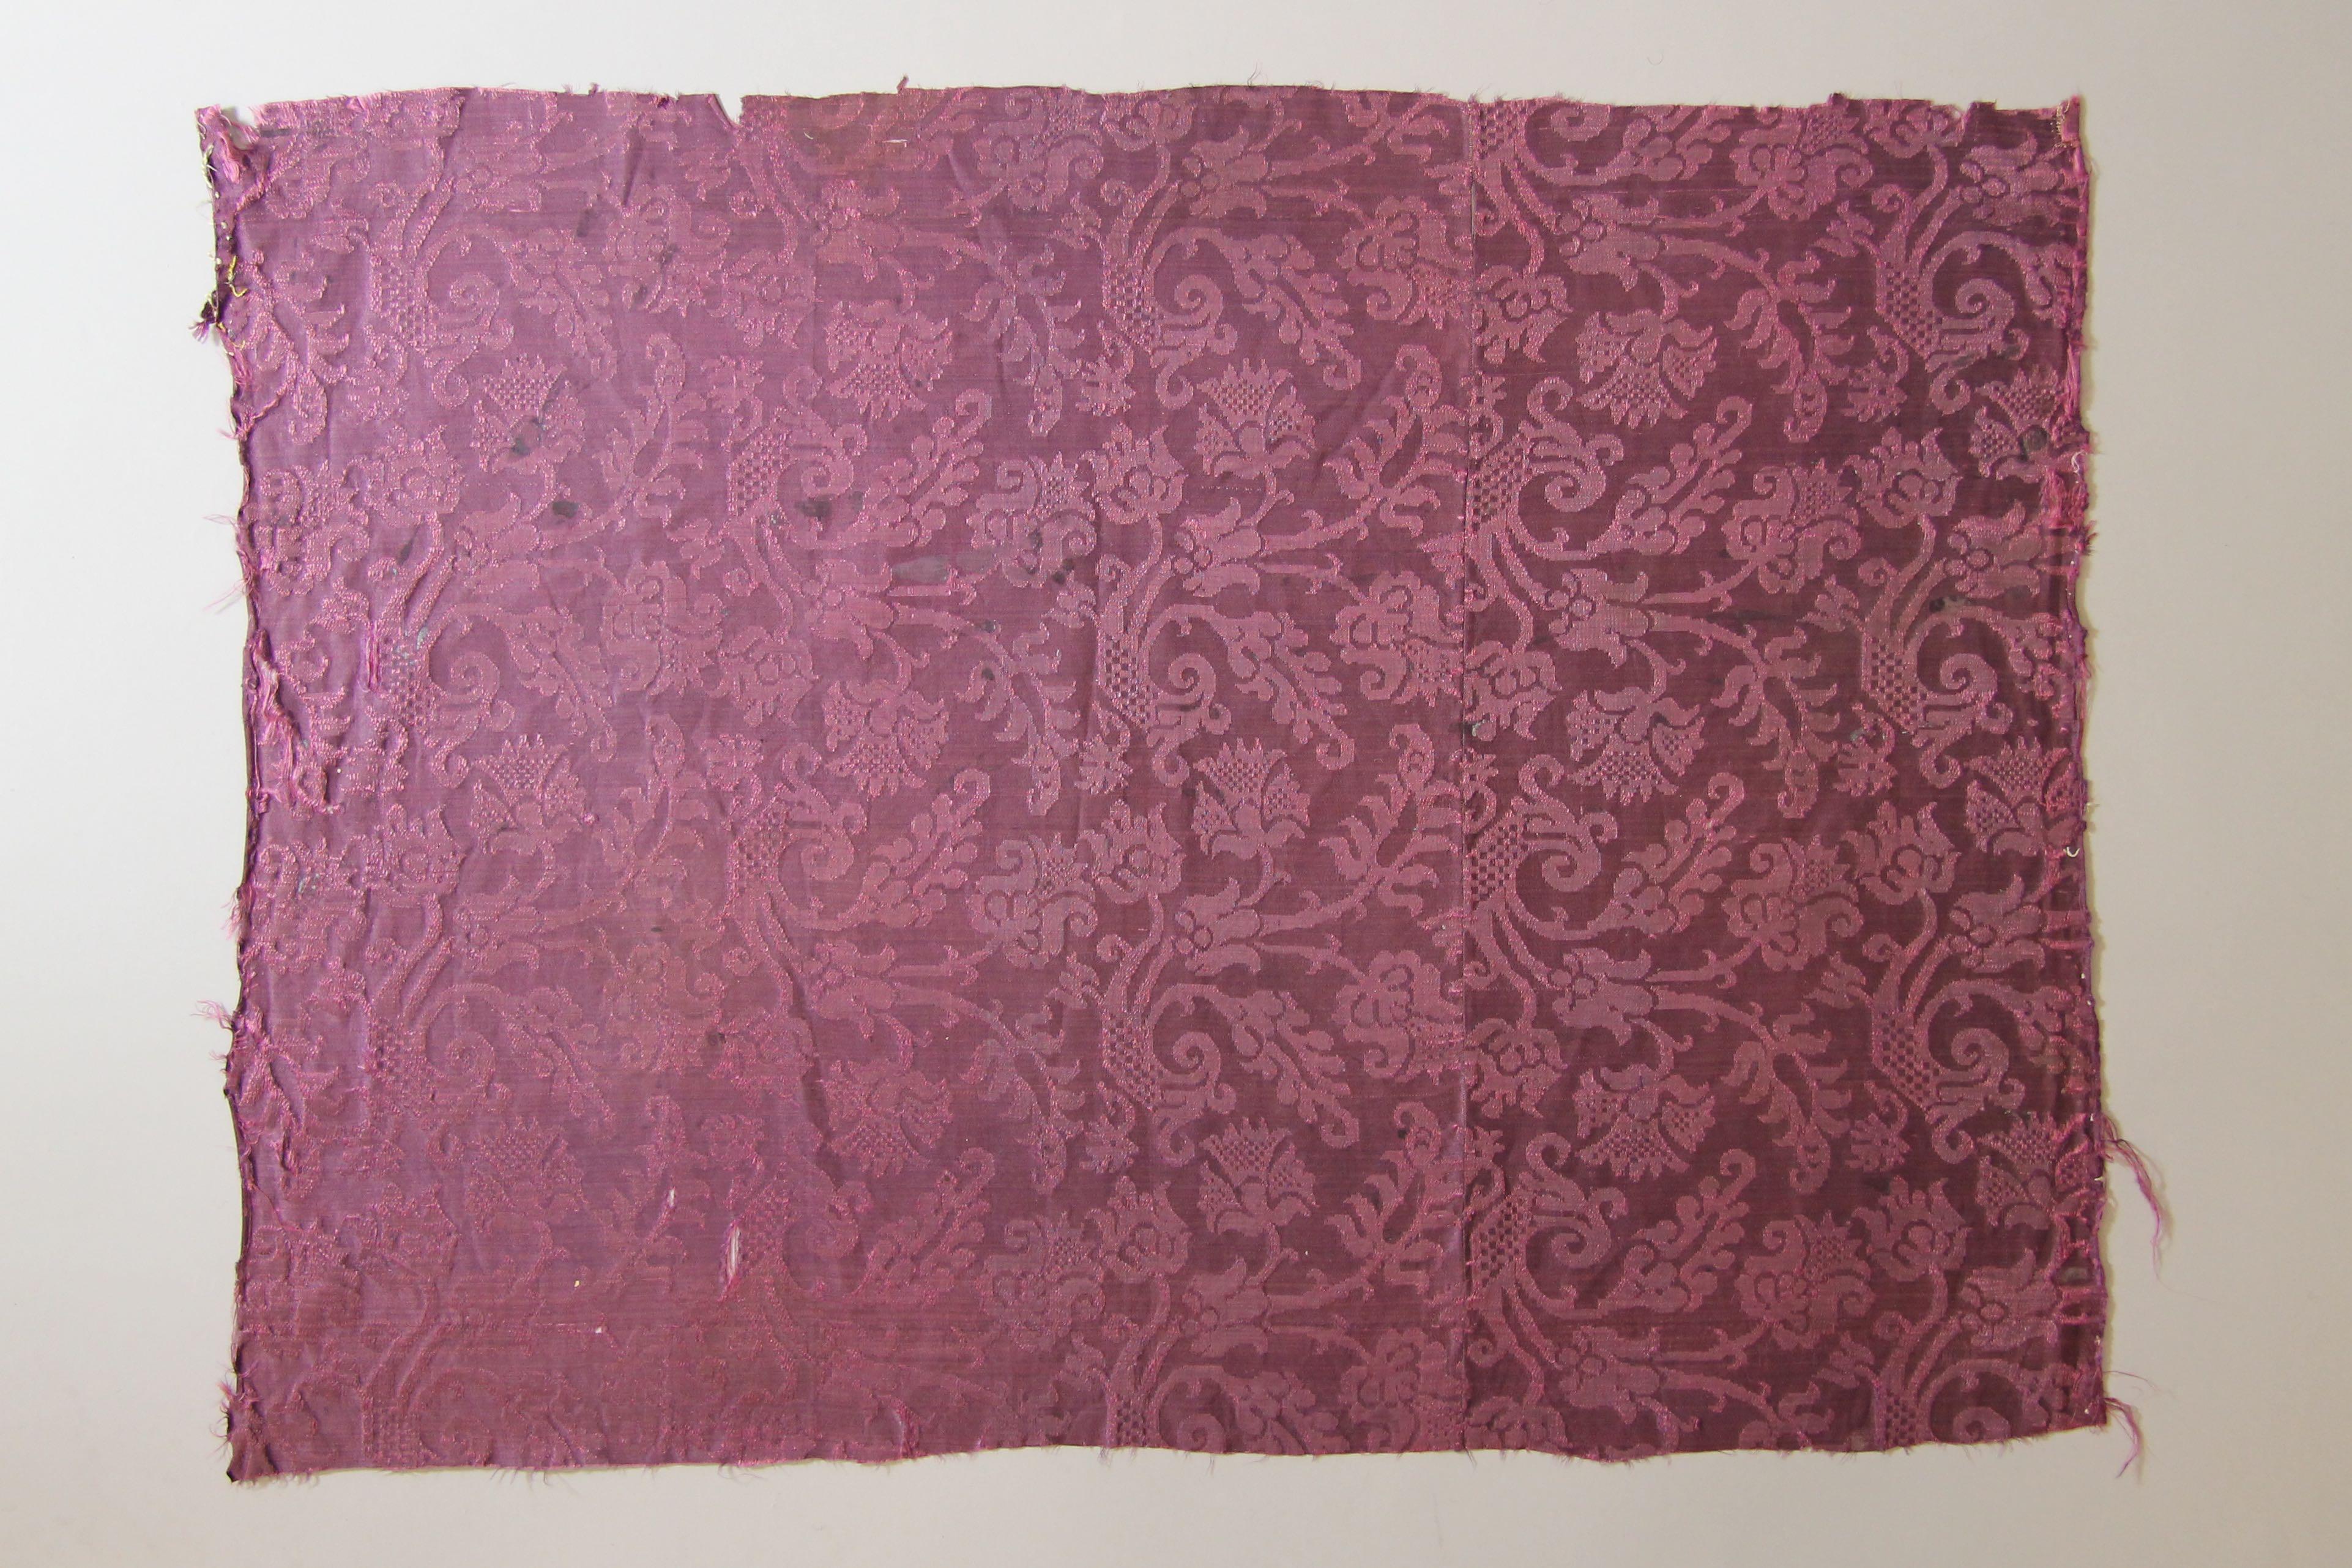 Panel of silk damask (fragment)